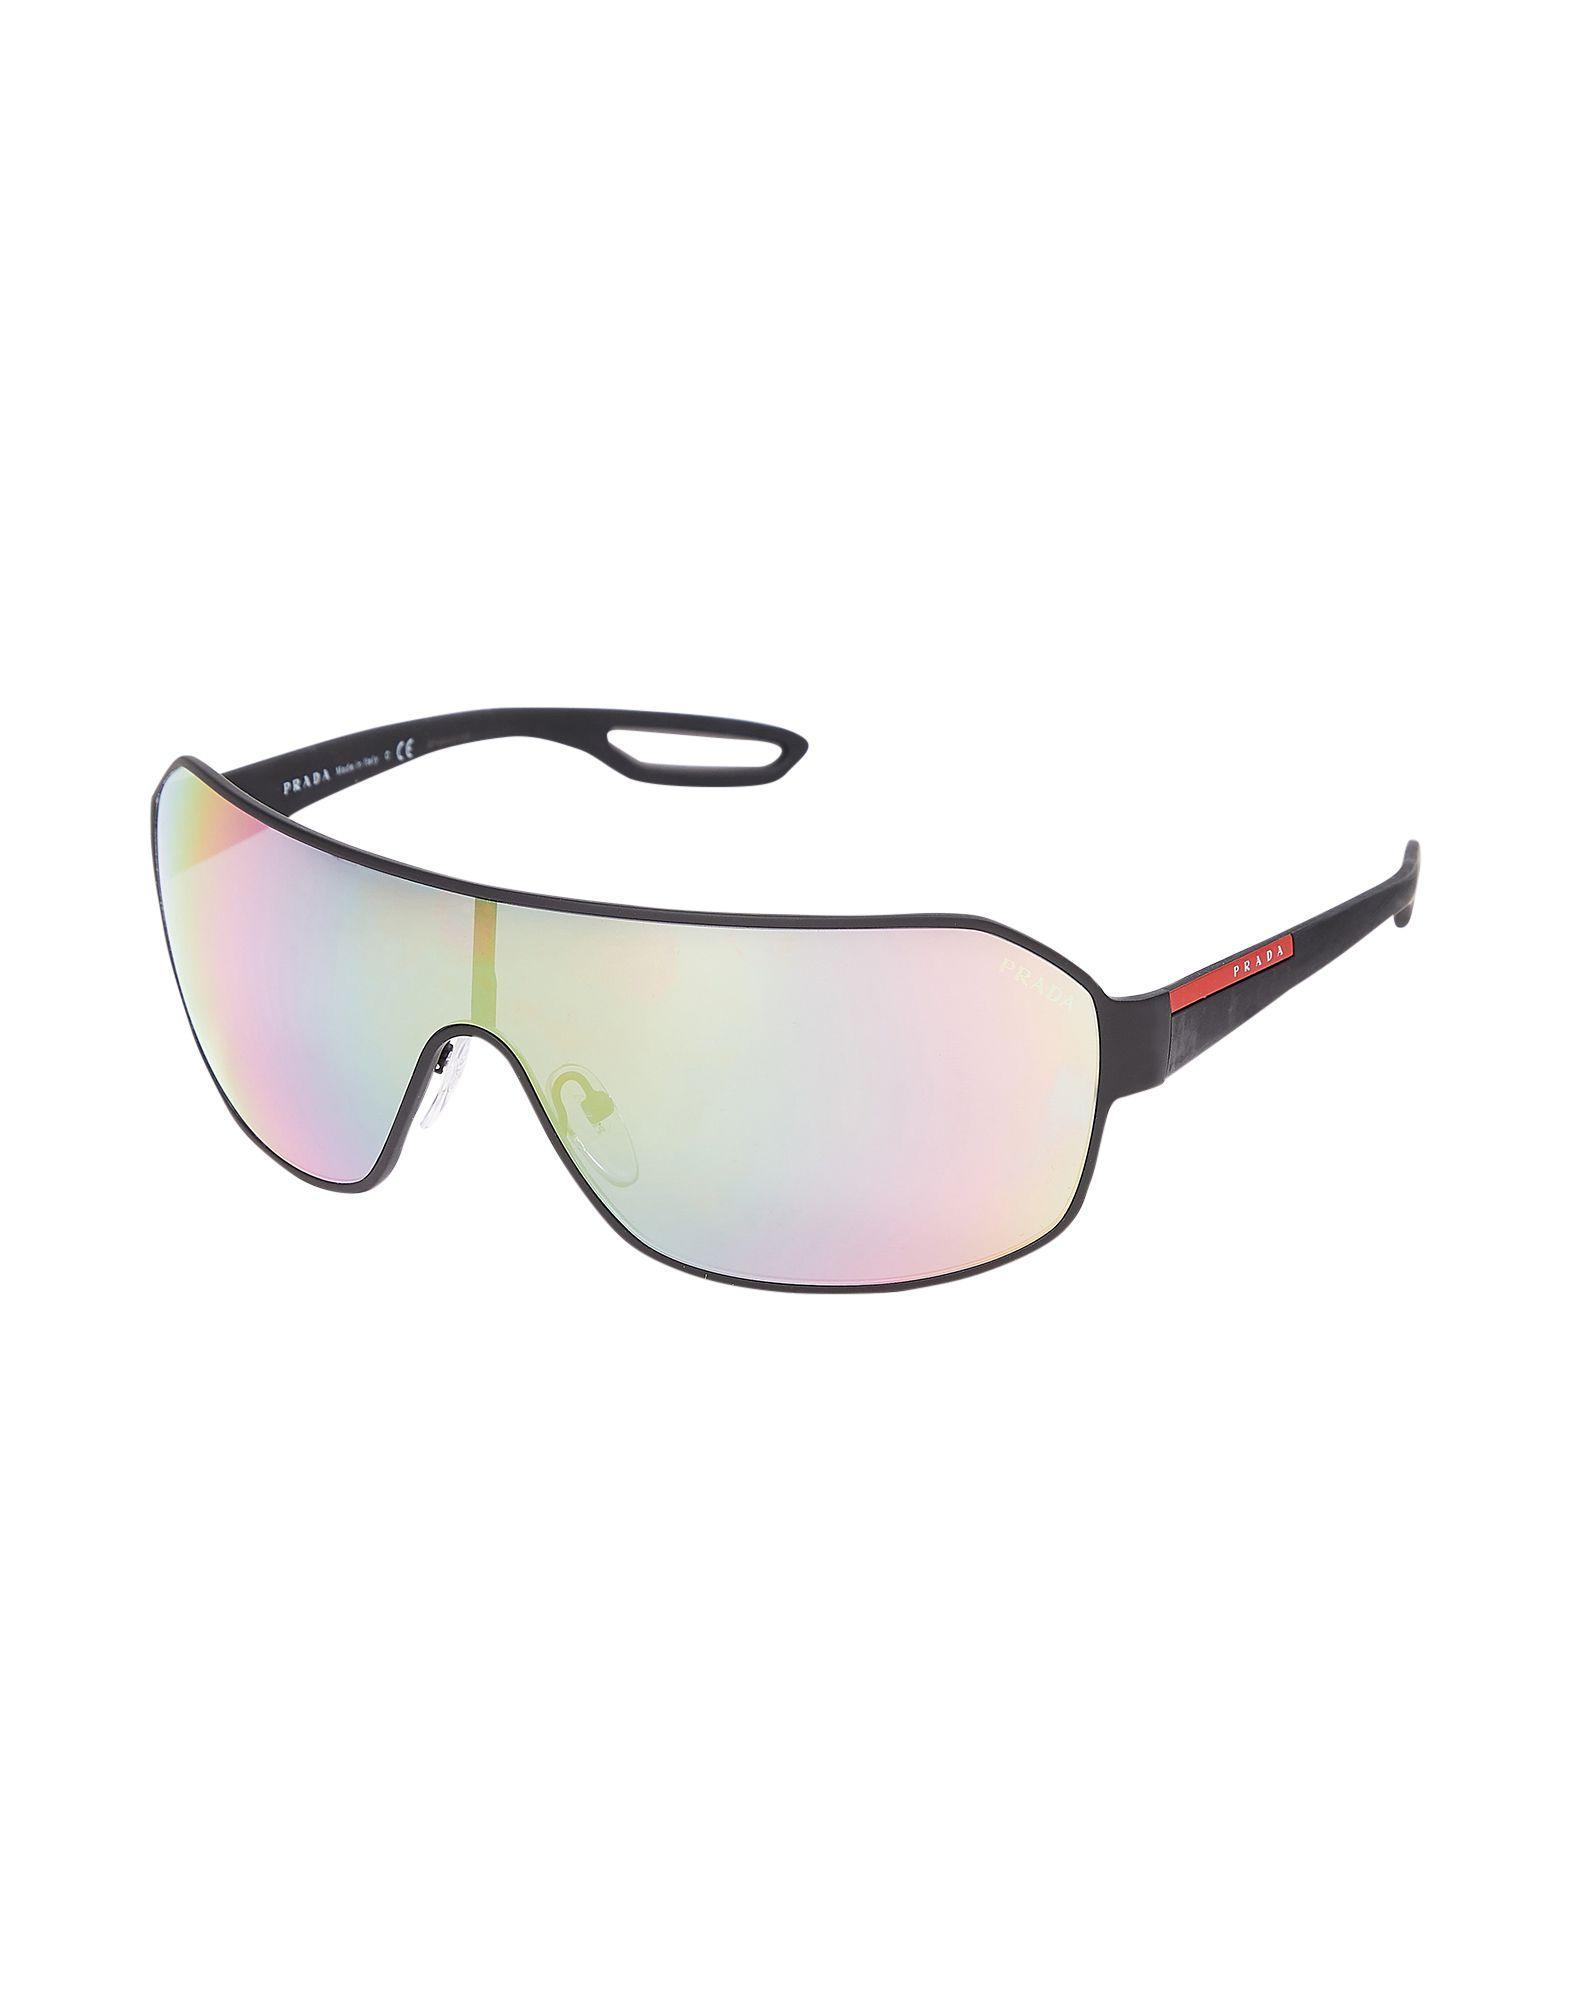 88fee558ff Prada - Black Sunglasses for Men - Lyst. View fullscreen